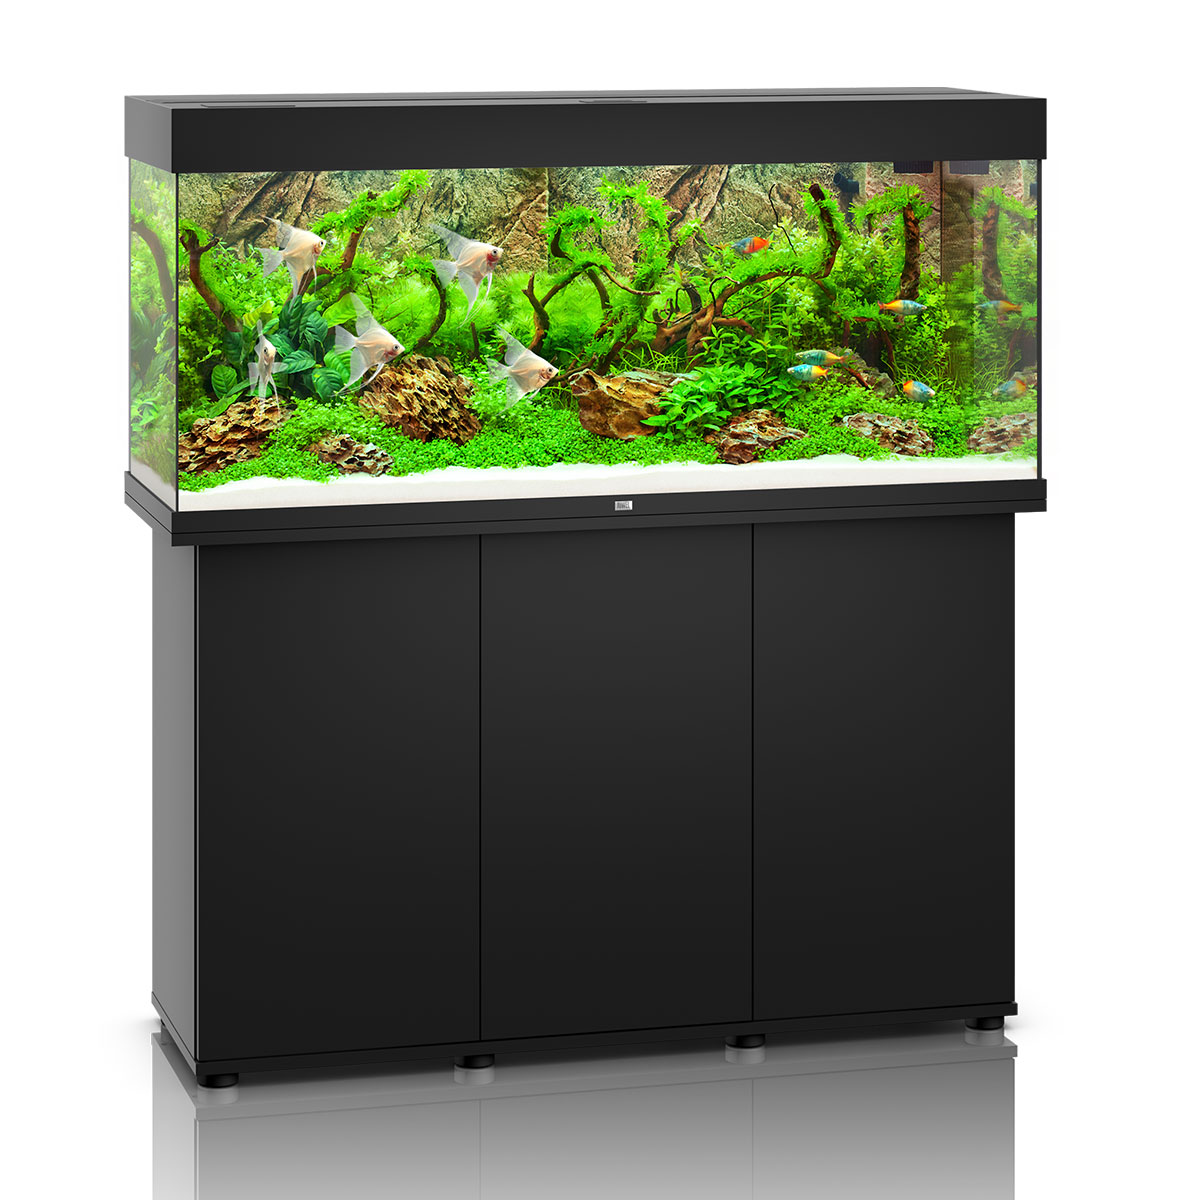 juwel rio 240 led komplett aquarium mit unterschrank sbx. Black Bedroom Furniture Sets. Home Design Ideas